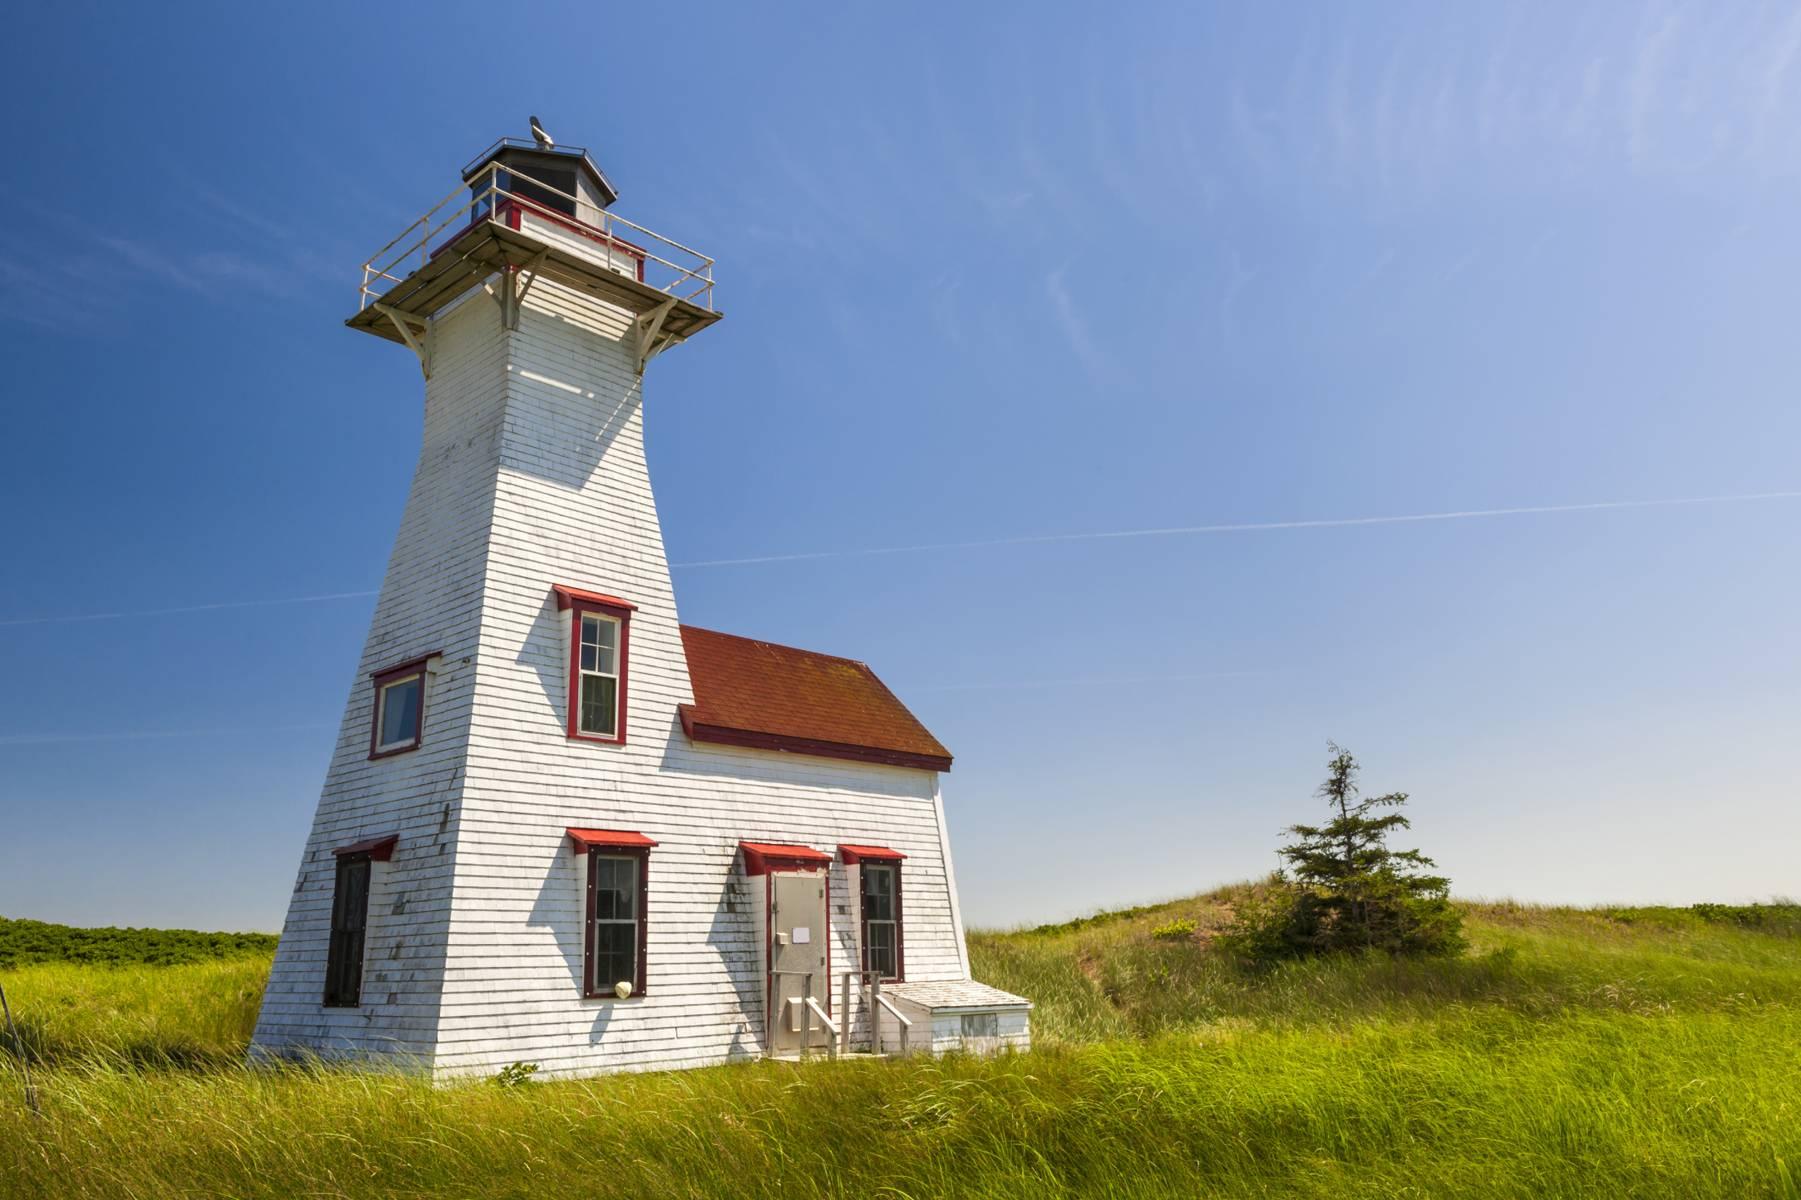 10-Day Nova Scotia and Prince Edward Island Tour Package